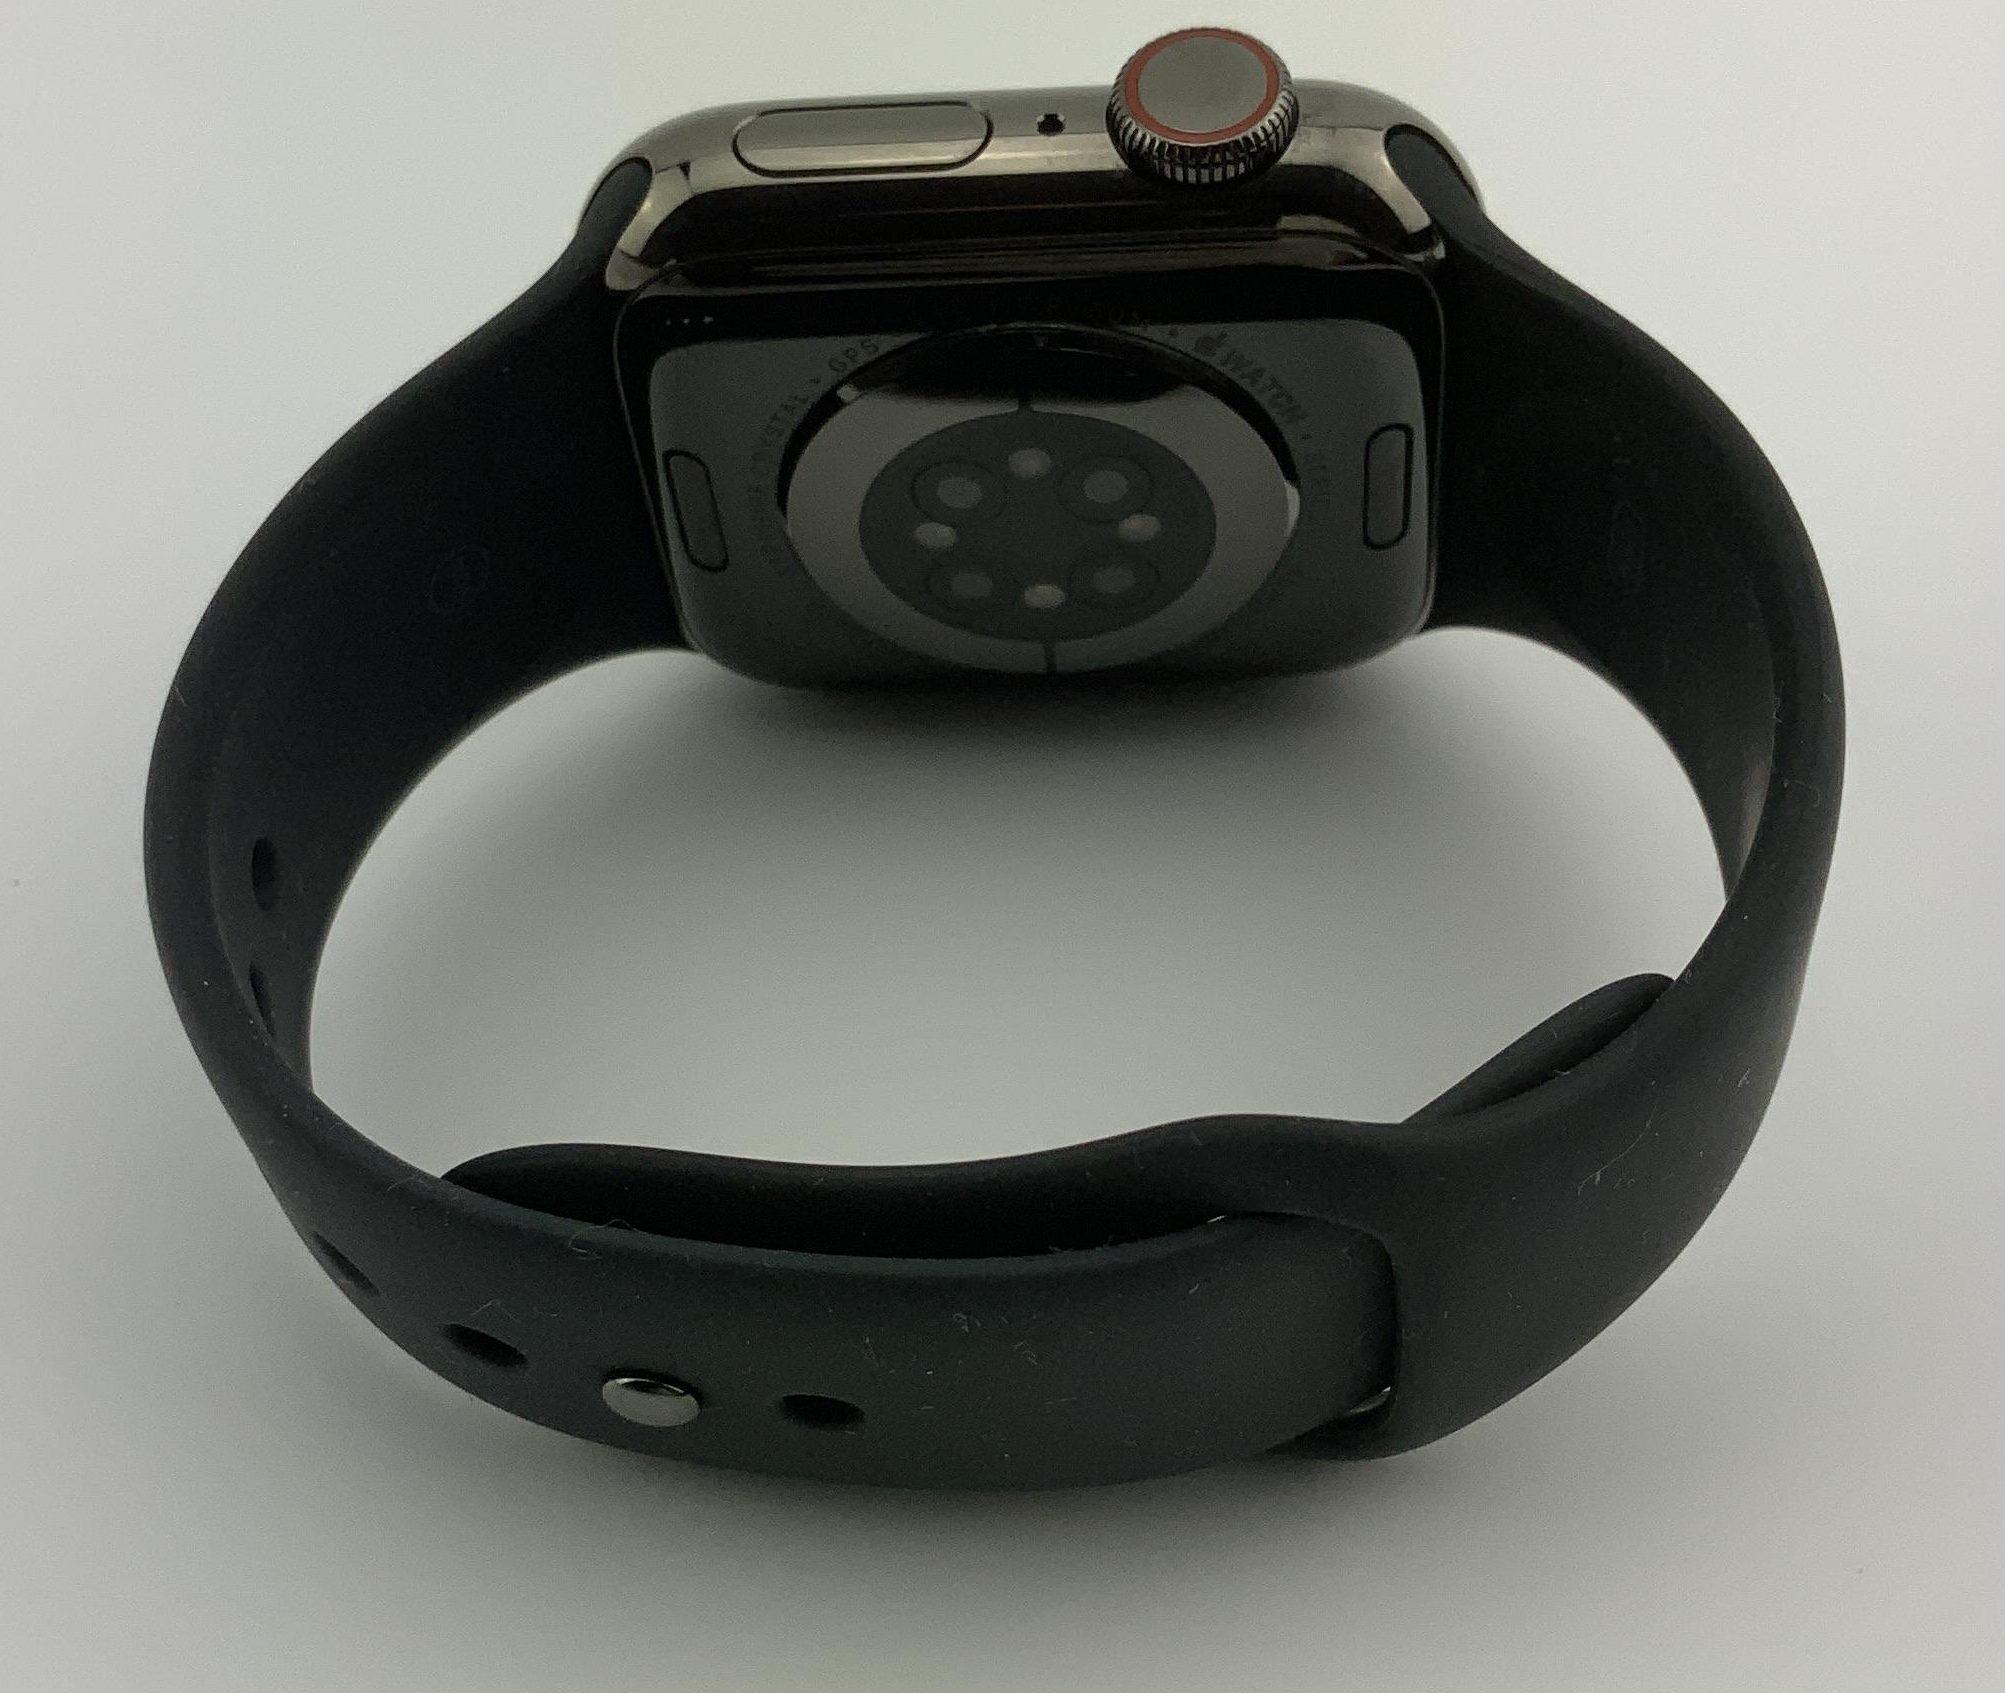 Watch Series 6 Steel Cellular (40mm), Graphite, Kuva 3